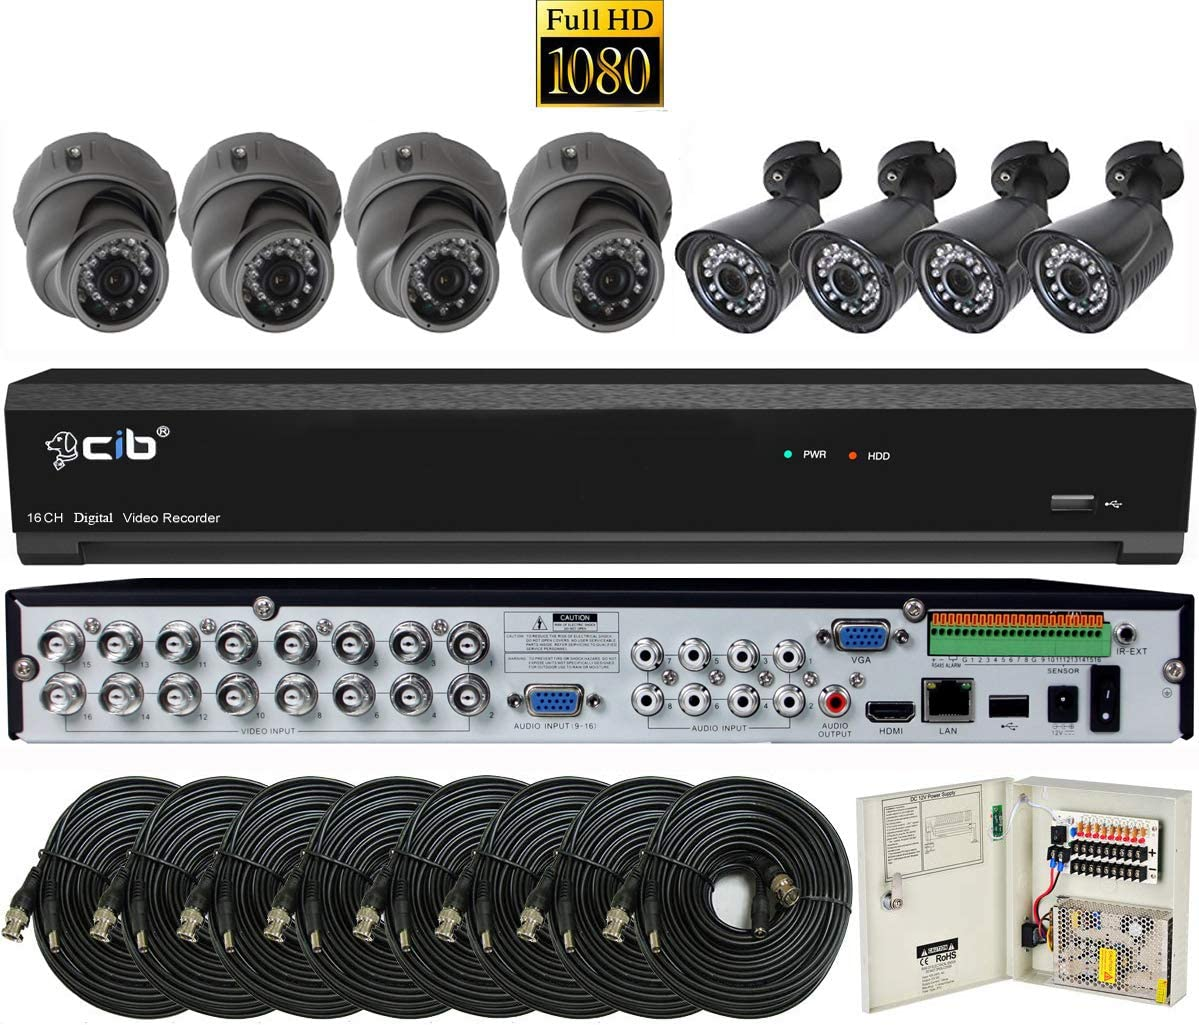 CIB Security H80P16K2T5603G-8KIT 16CH 1080P DVR, 2TB HDD & 8x2.1-MP 1920TVL Night Vision Camera, 4xDome, 4xBullet, Black